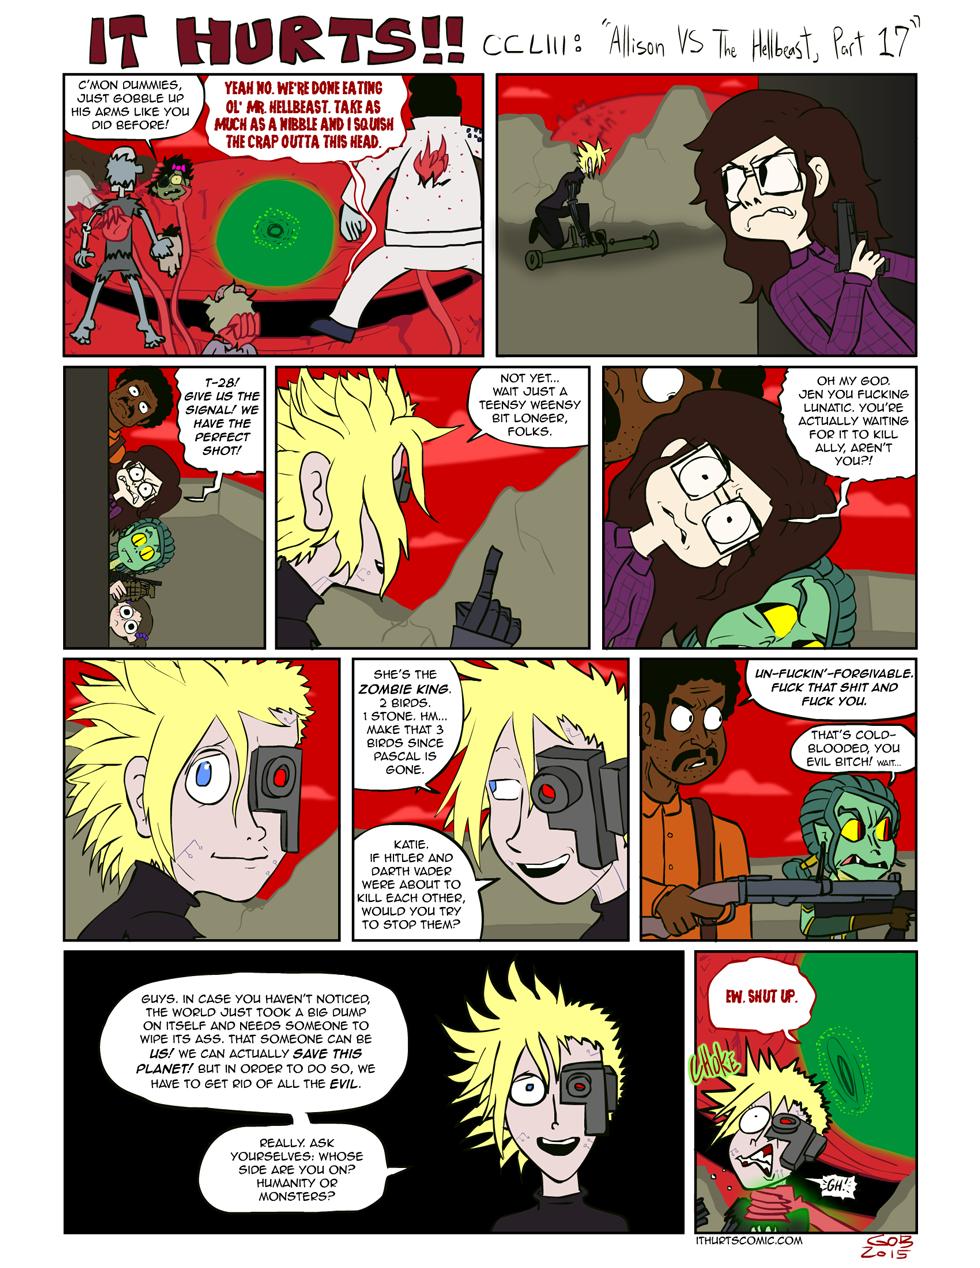 253: Allison VS The Hellbeast, Part 17